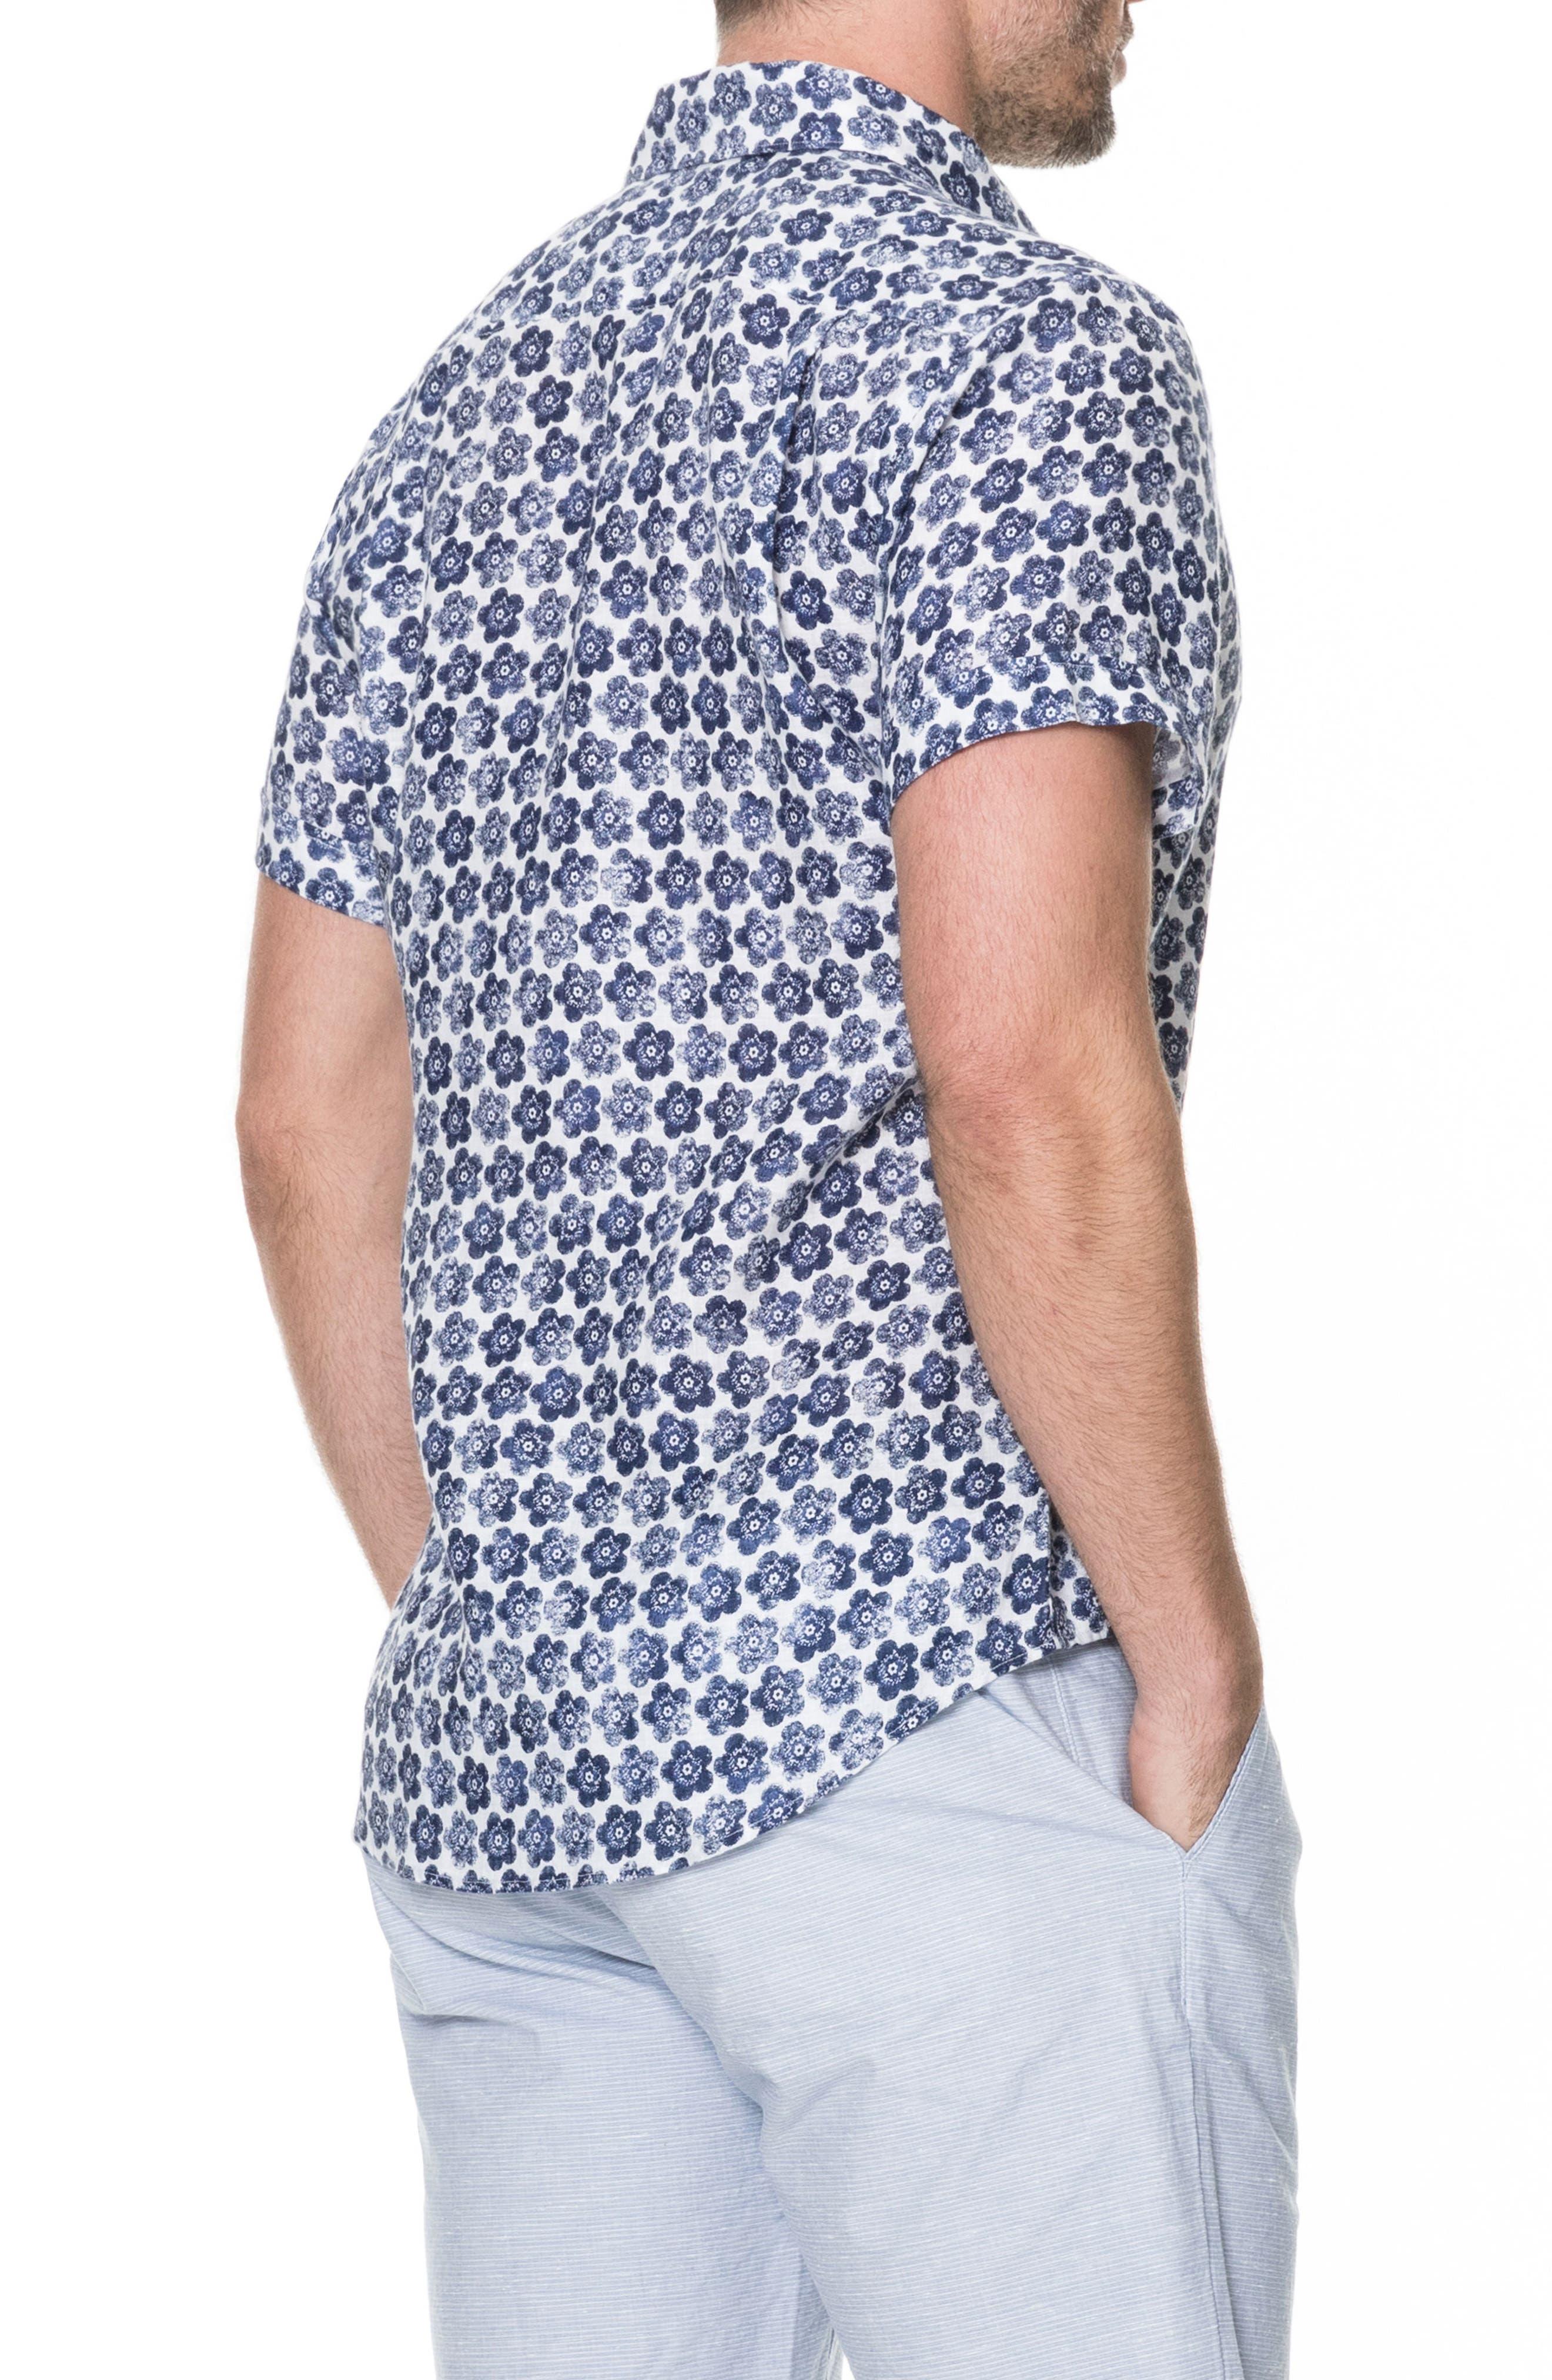 Keyburn Regular Fit Sport Shirt,                             Alternate thumbnail 2, color,                             PEACOAT